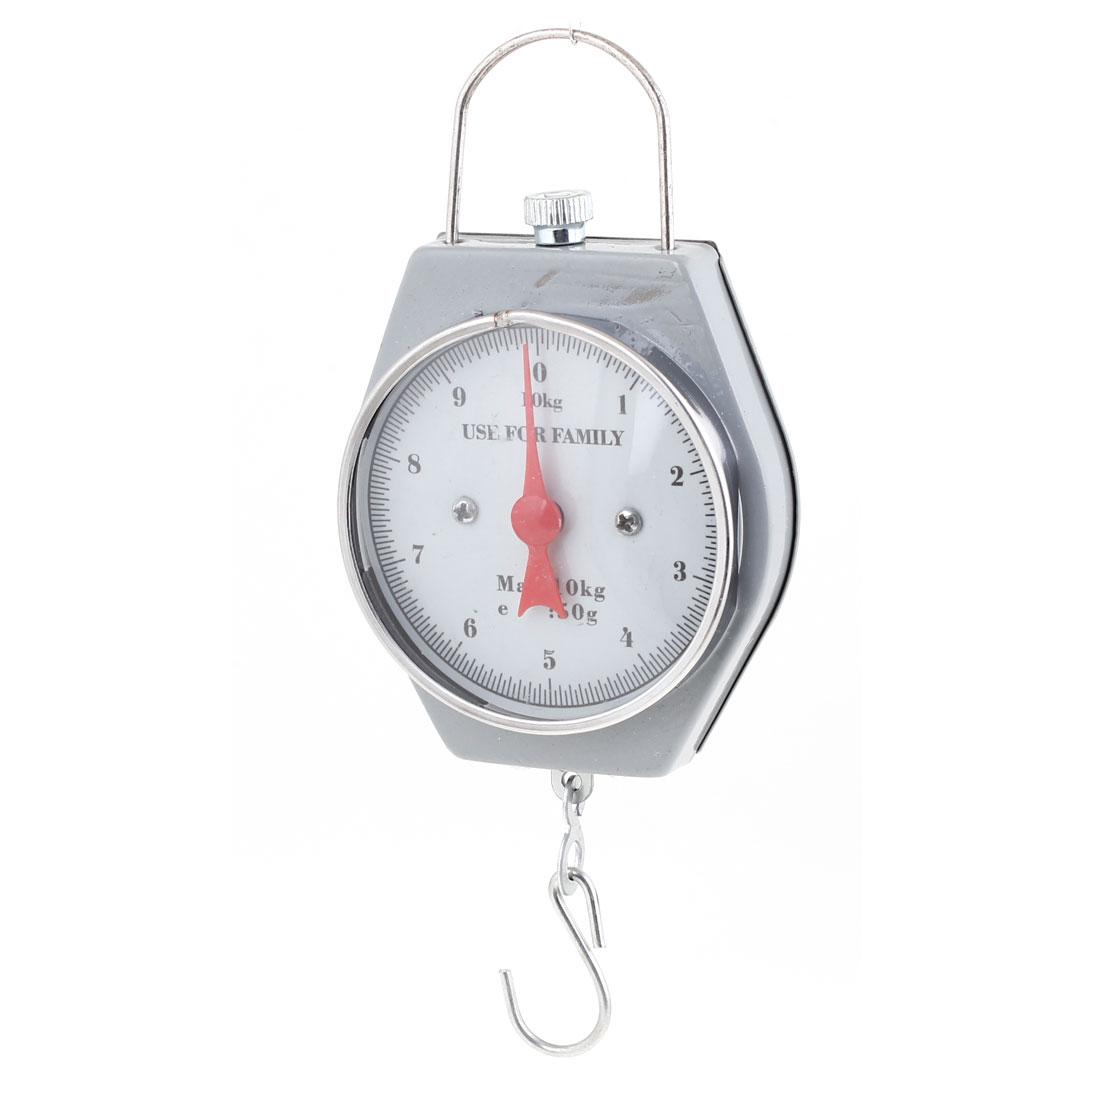 Gray Silver Tone Measure Tool Max Capacity 10Kg Portable Handheld Scale